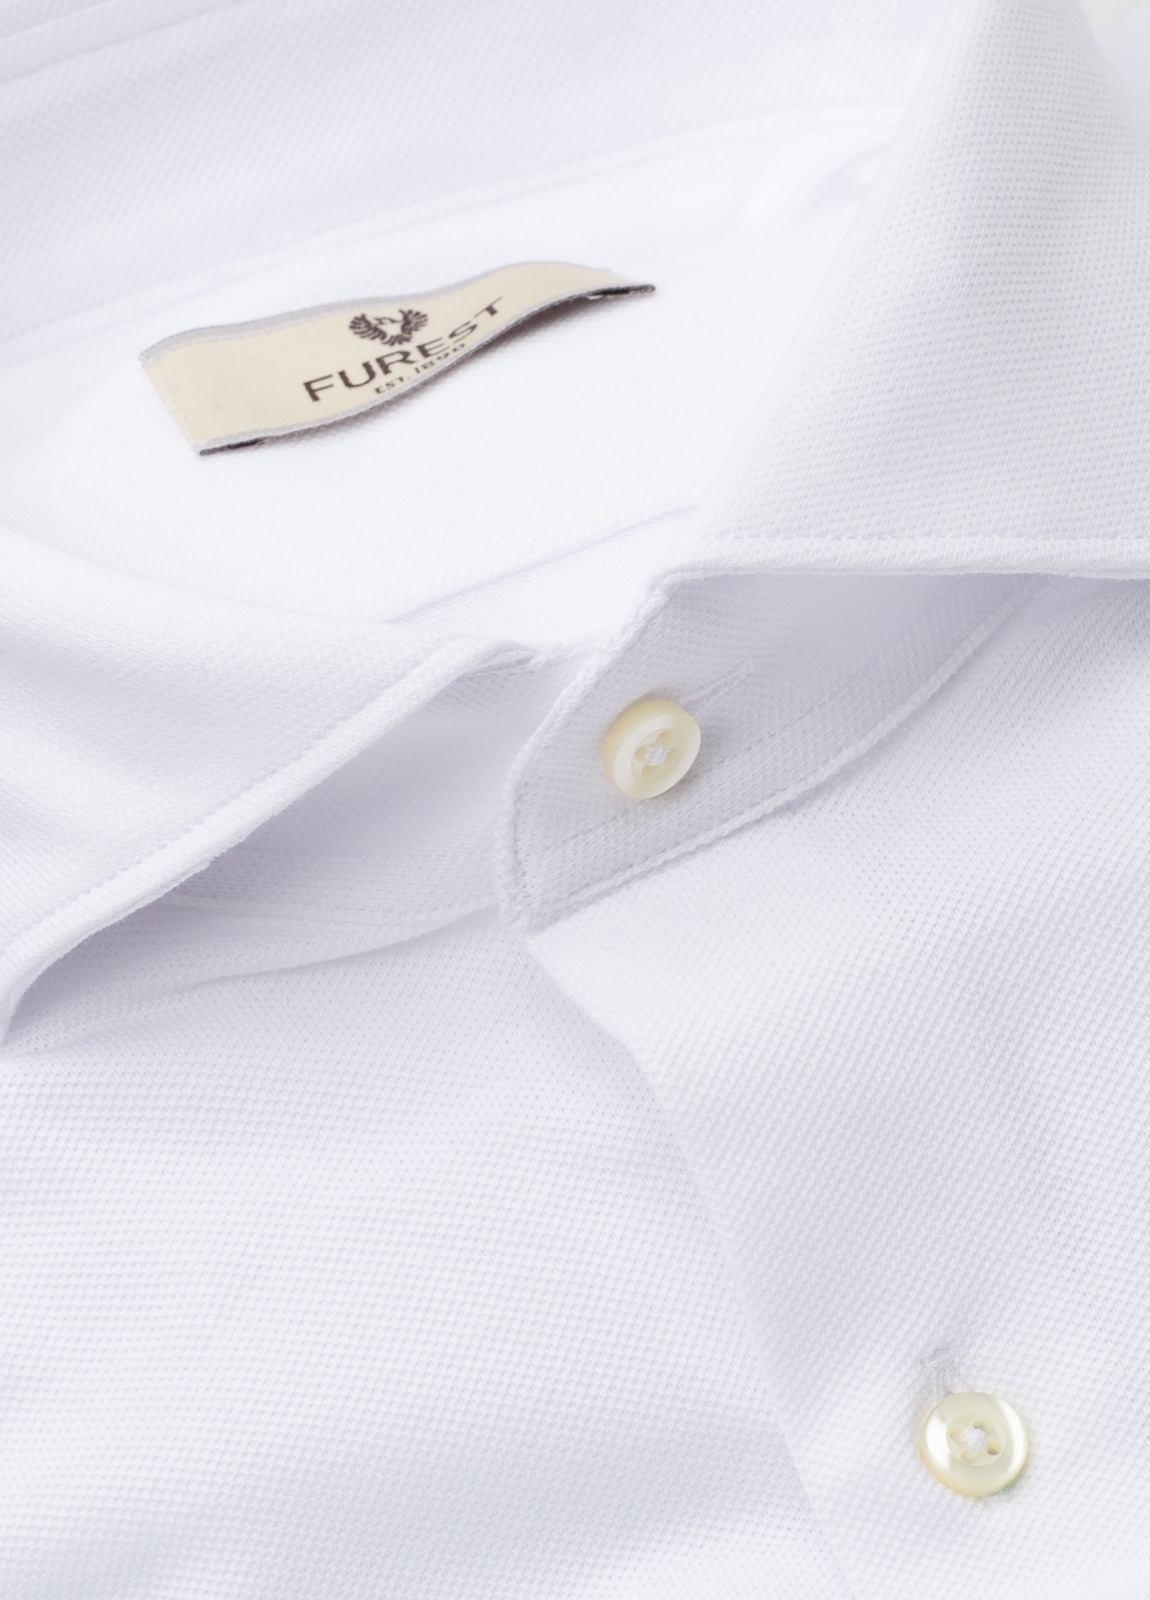 Camisa Leisure Wear SLIM FIT Modelo CAPRI tejido micro textura color blanco, 100% Algodón.